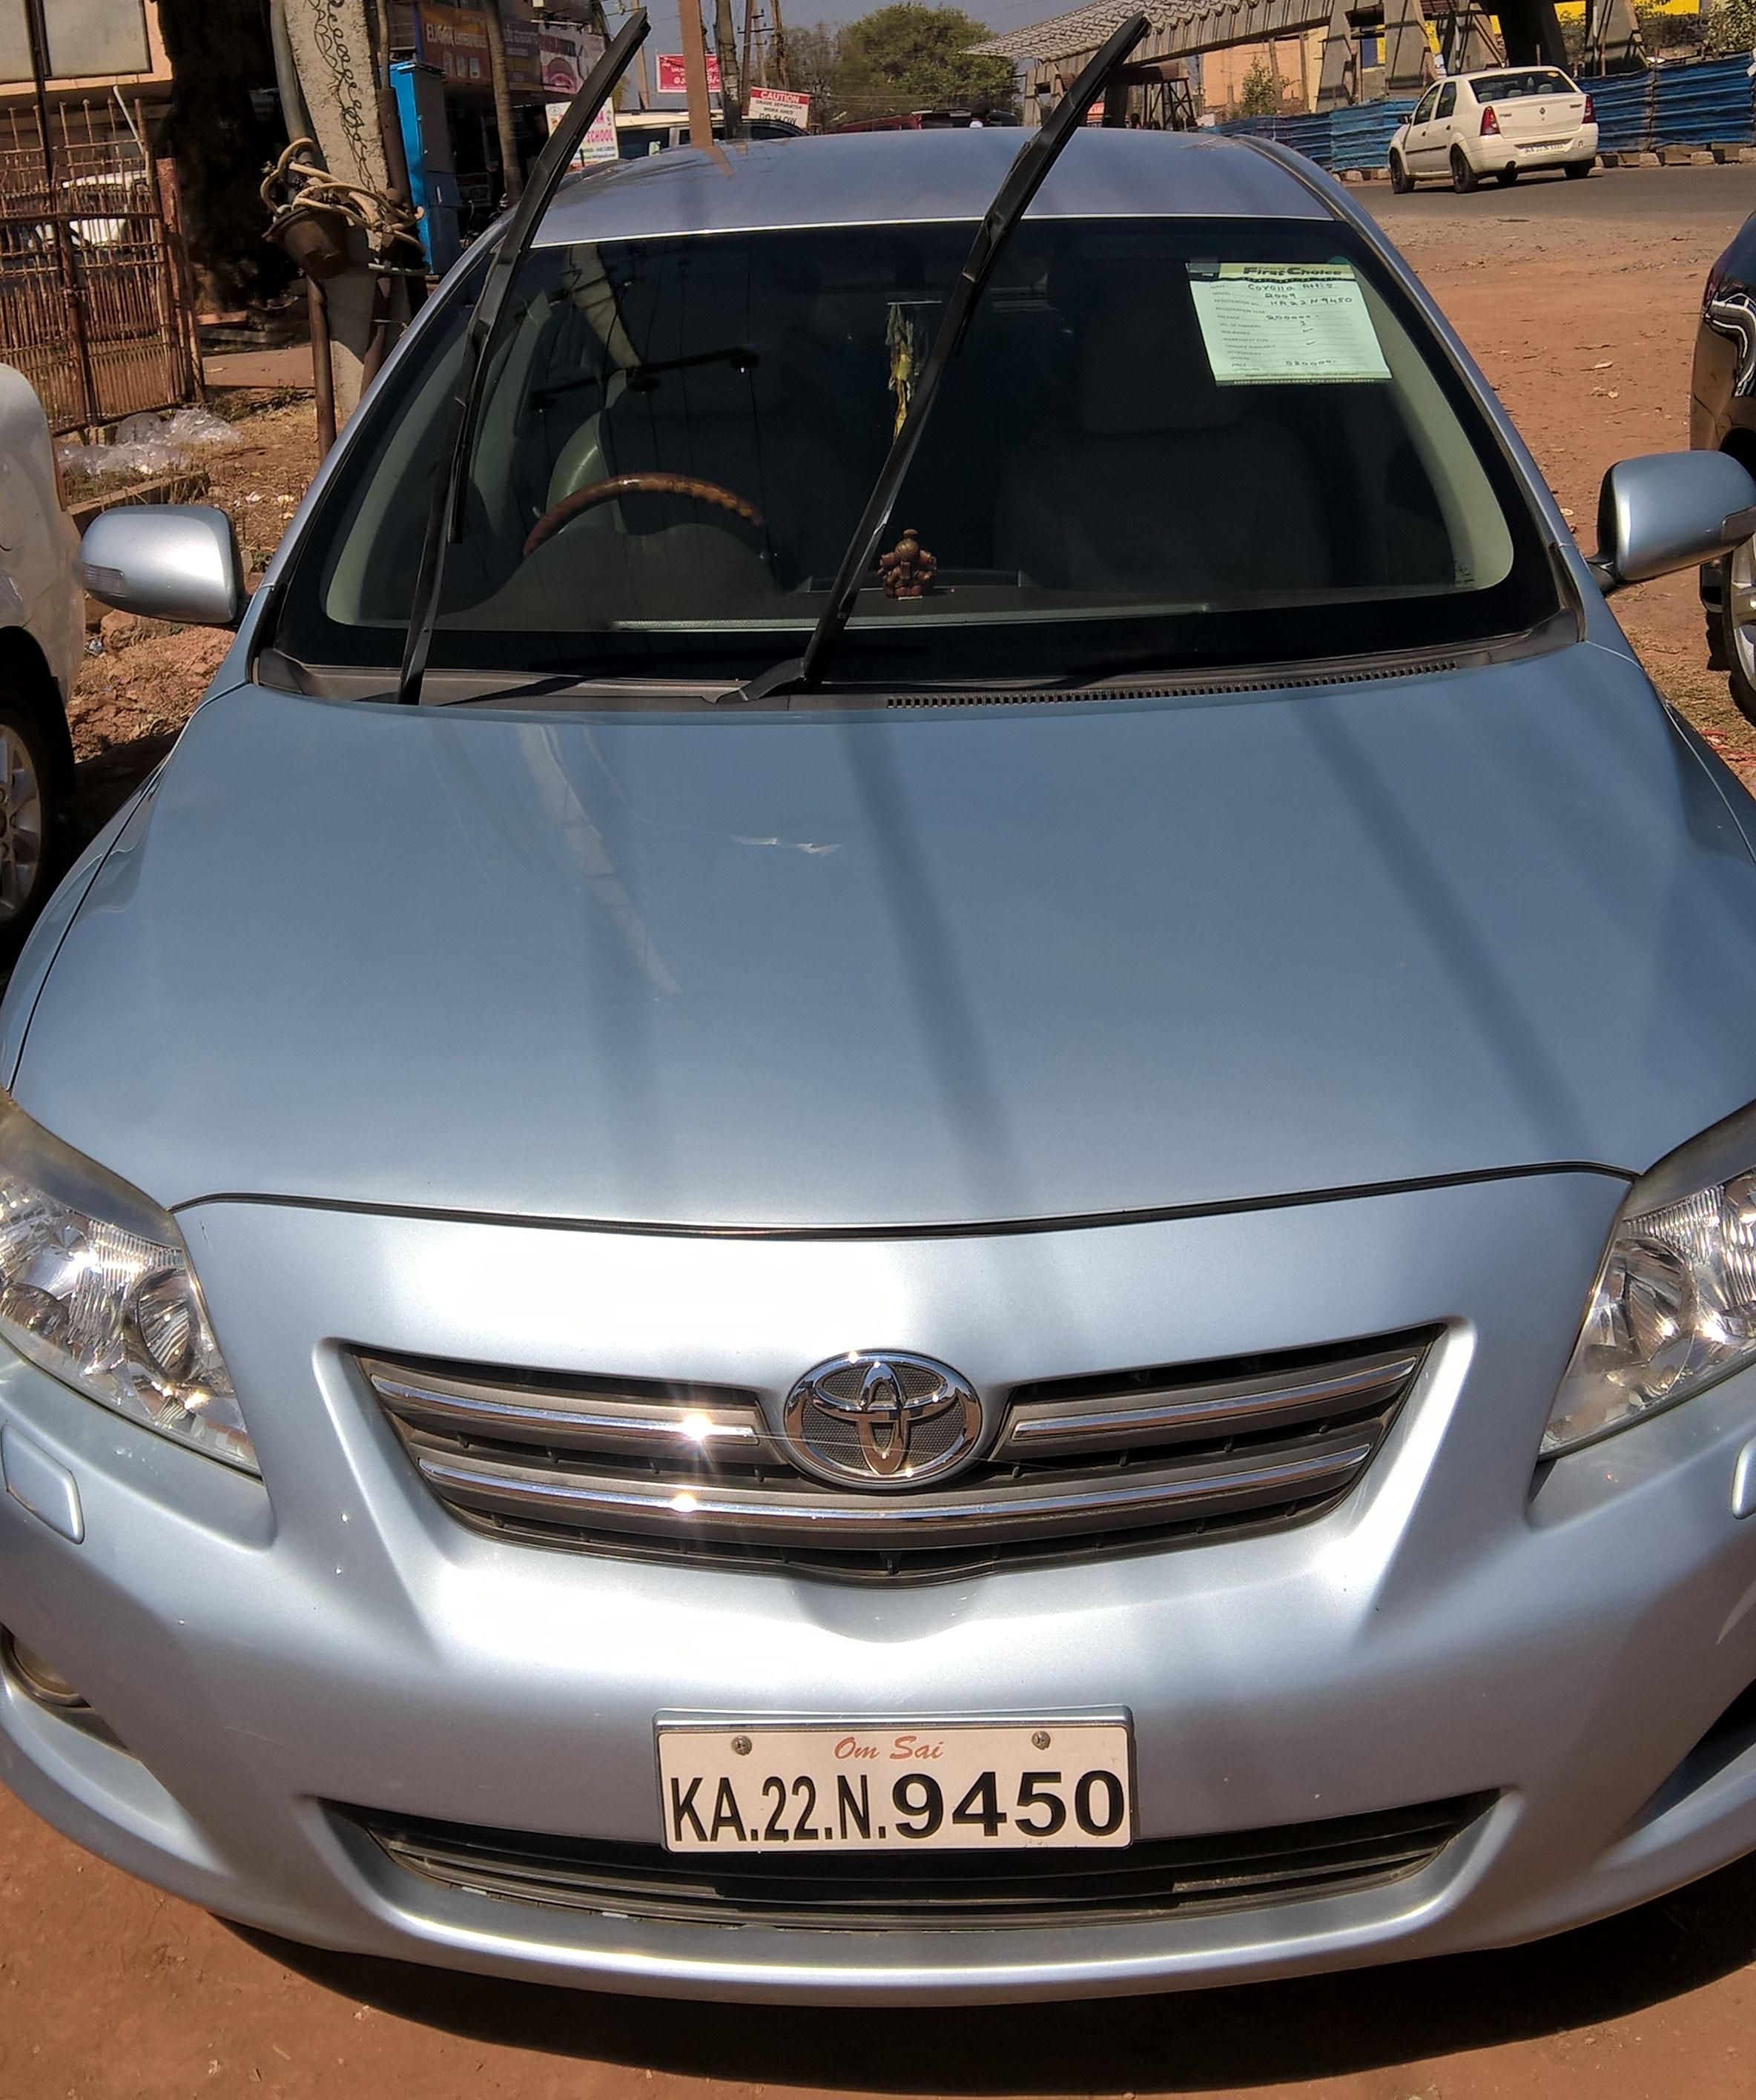 2009 Used Toyota Corolla Altis 1.8 G